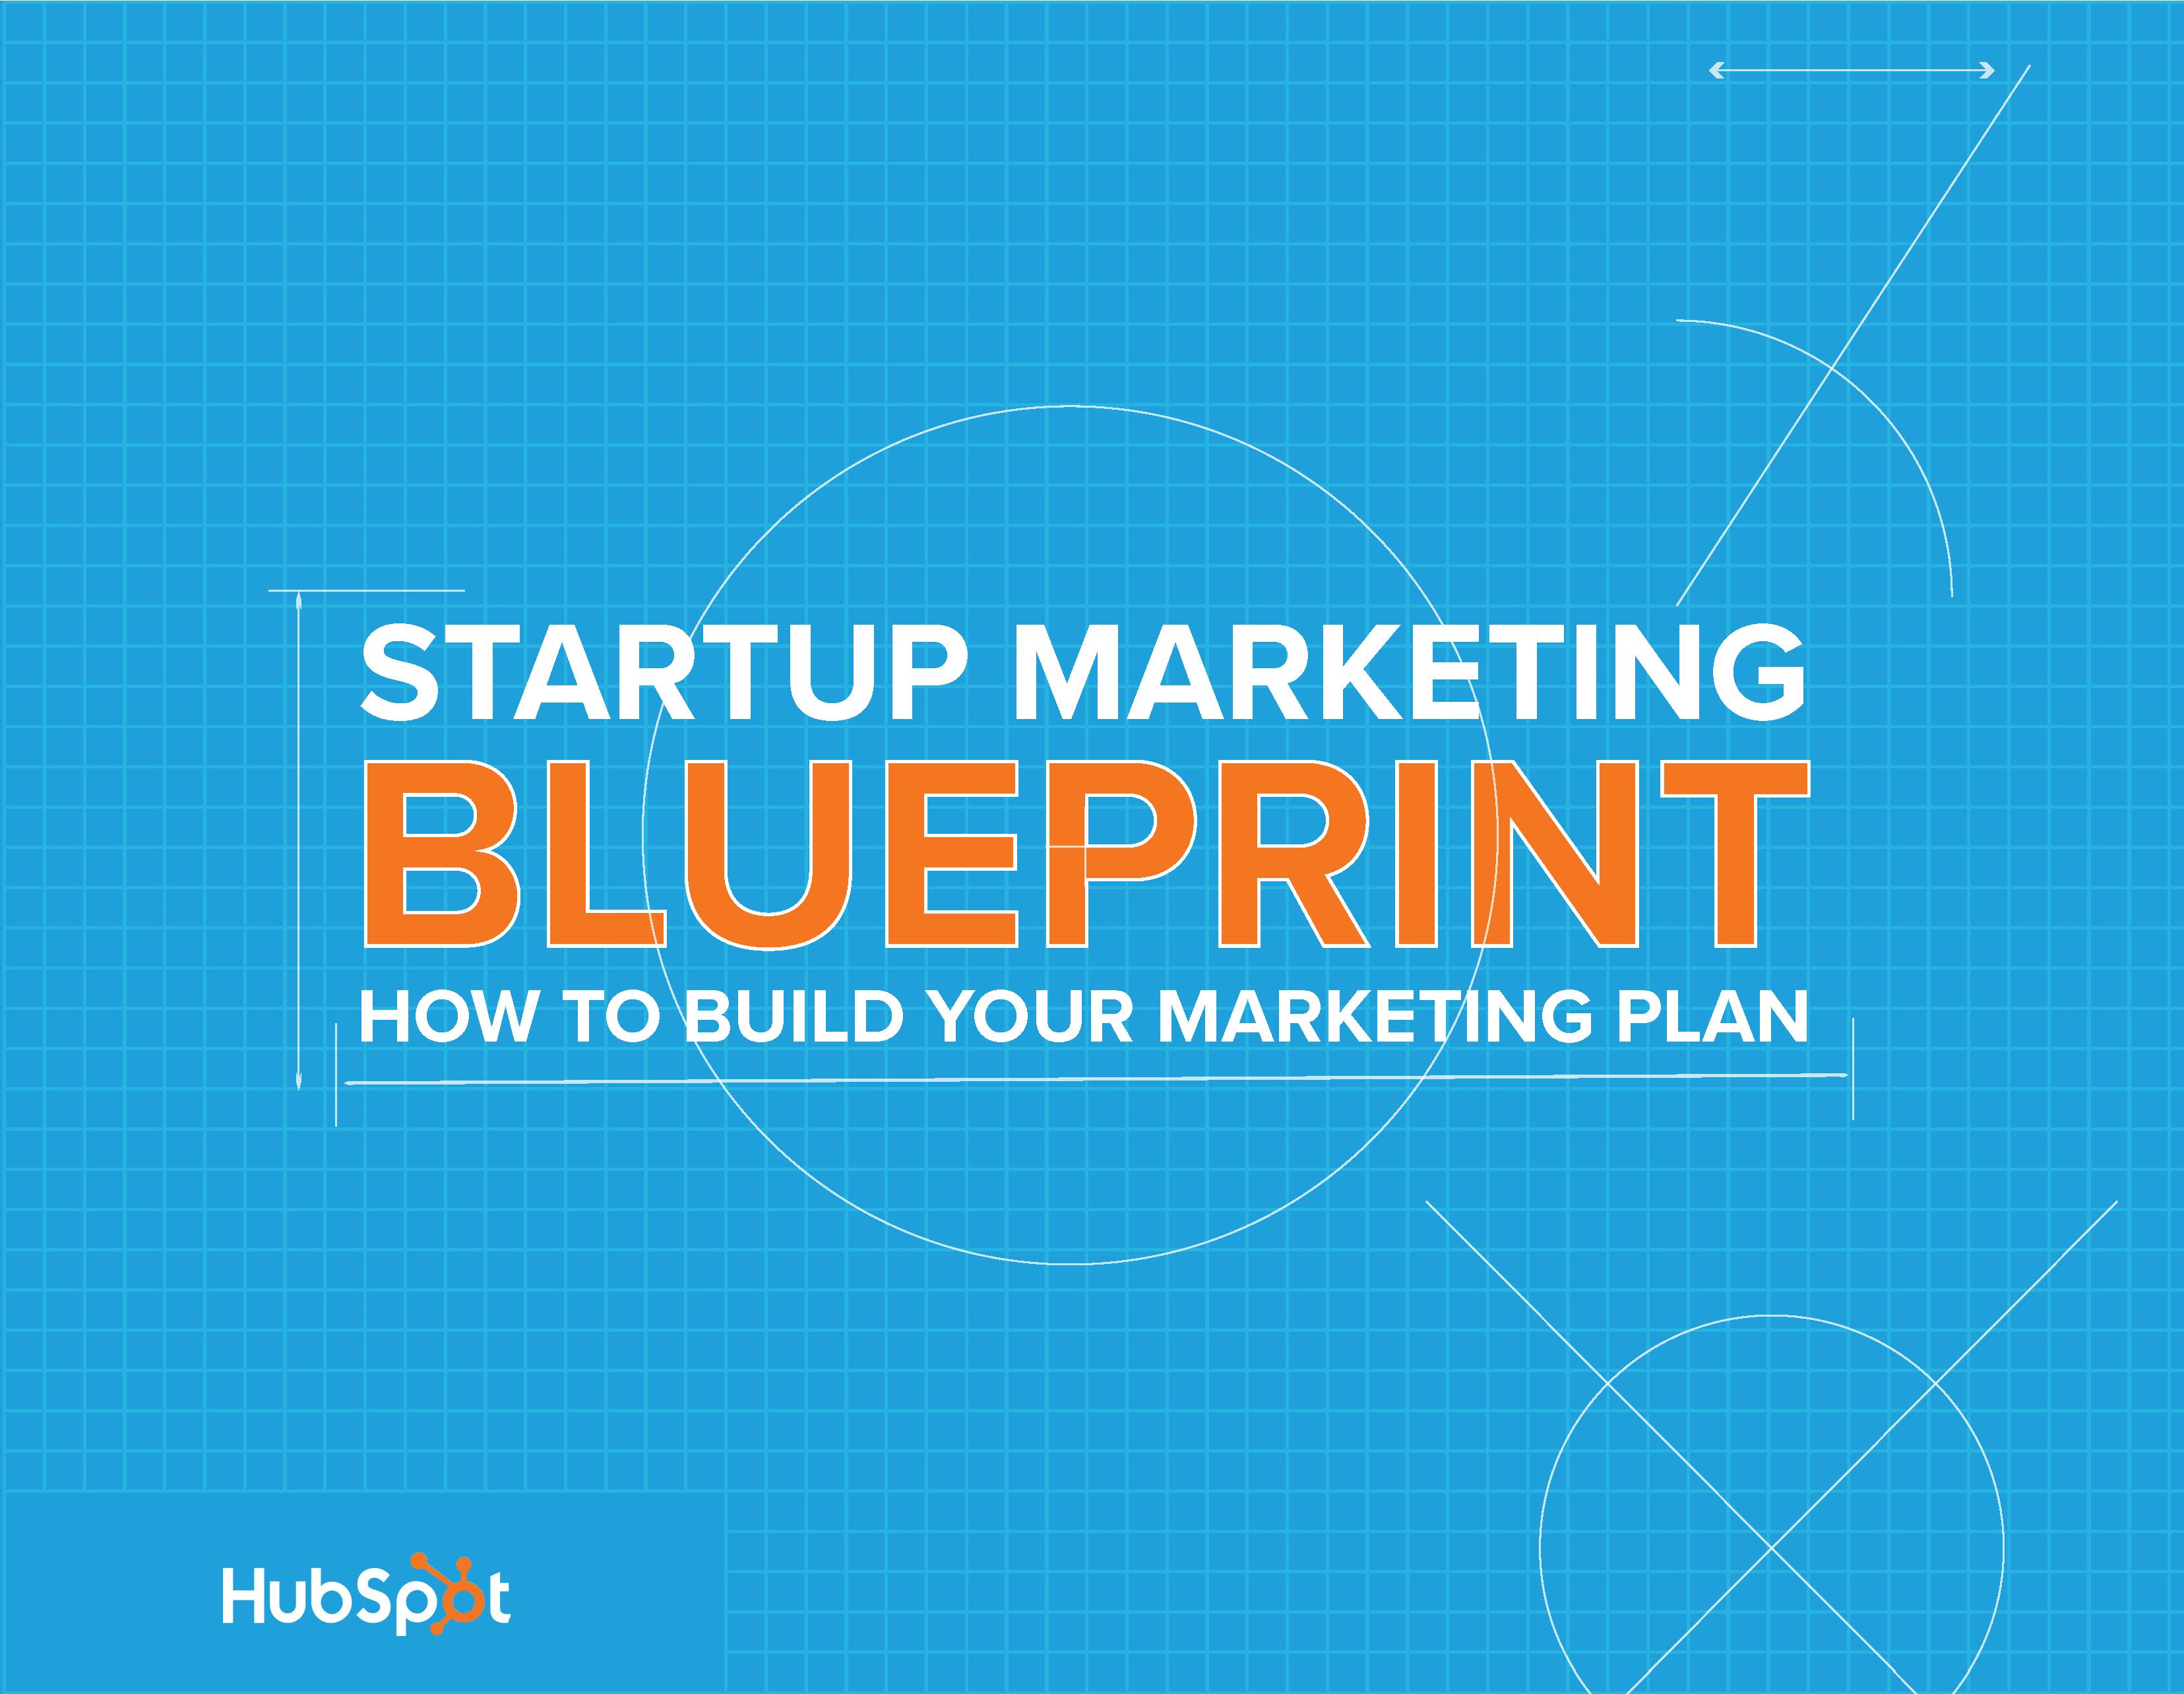 Startup marketing plan blueprint startup marketing blueprint preview malvernweather Images